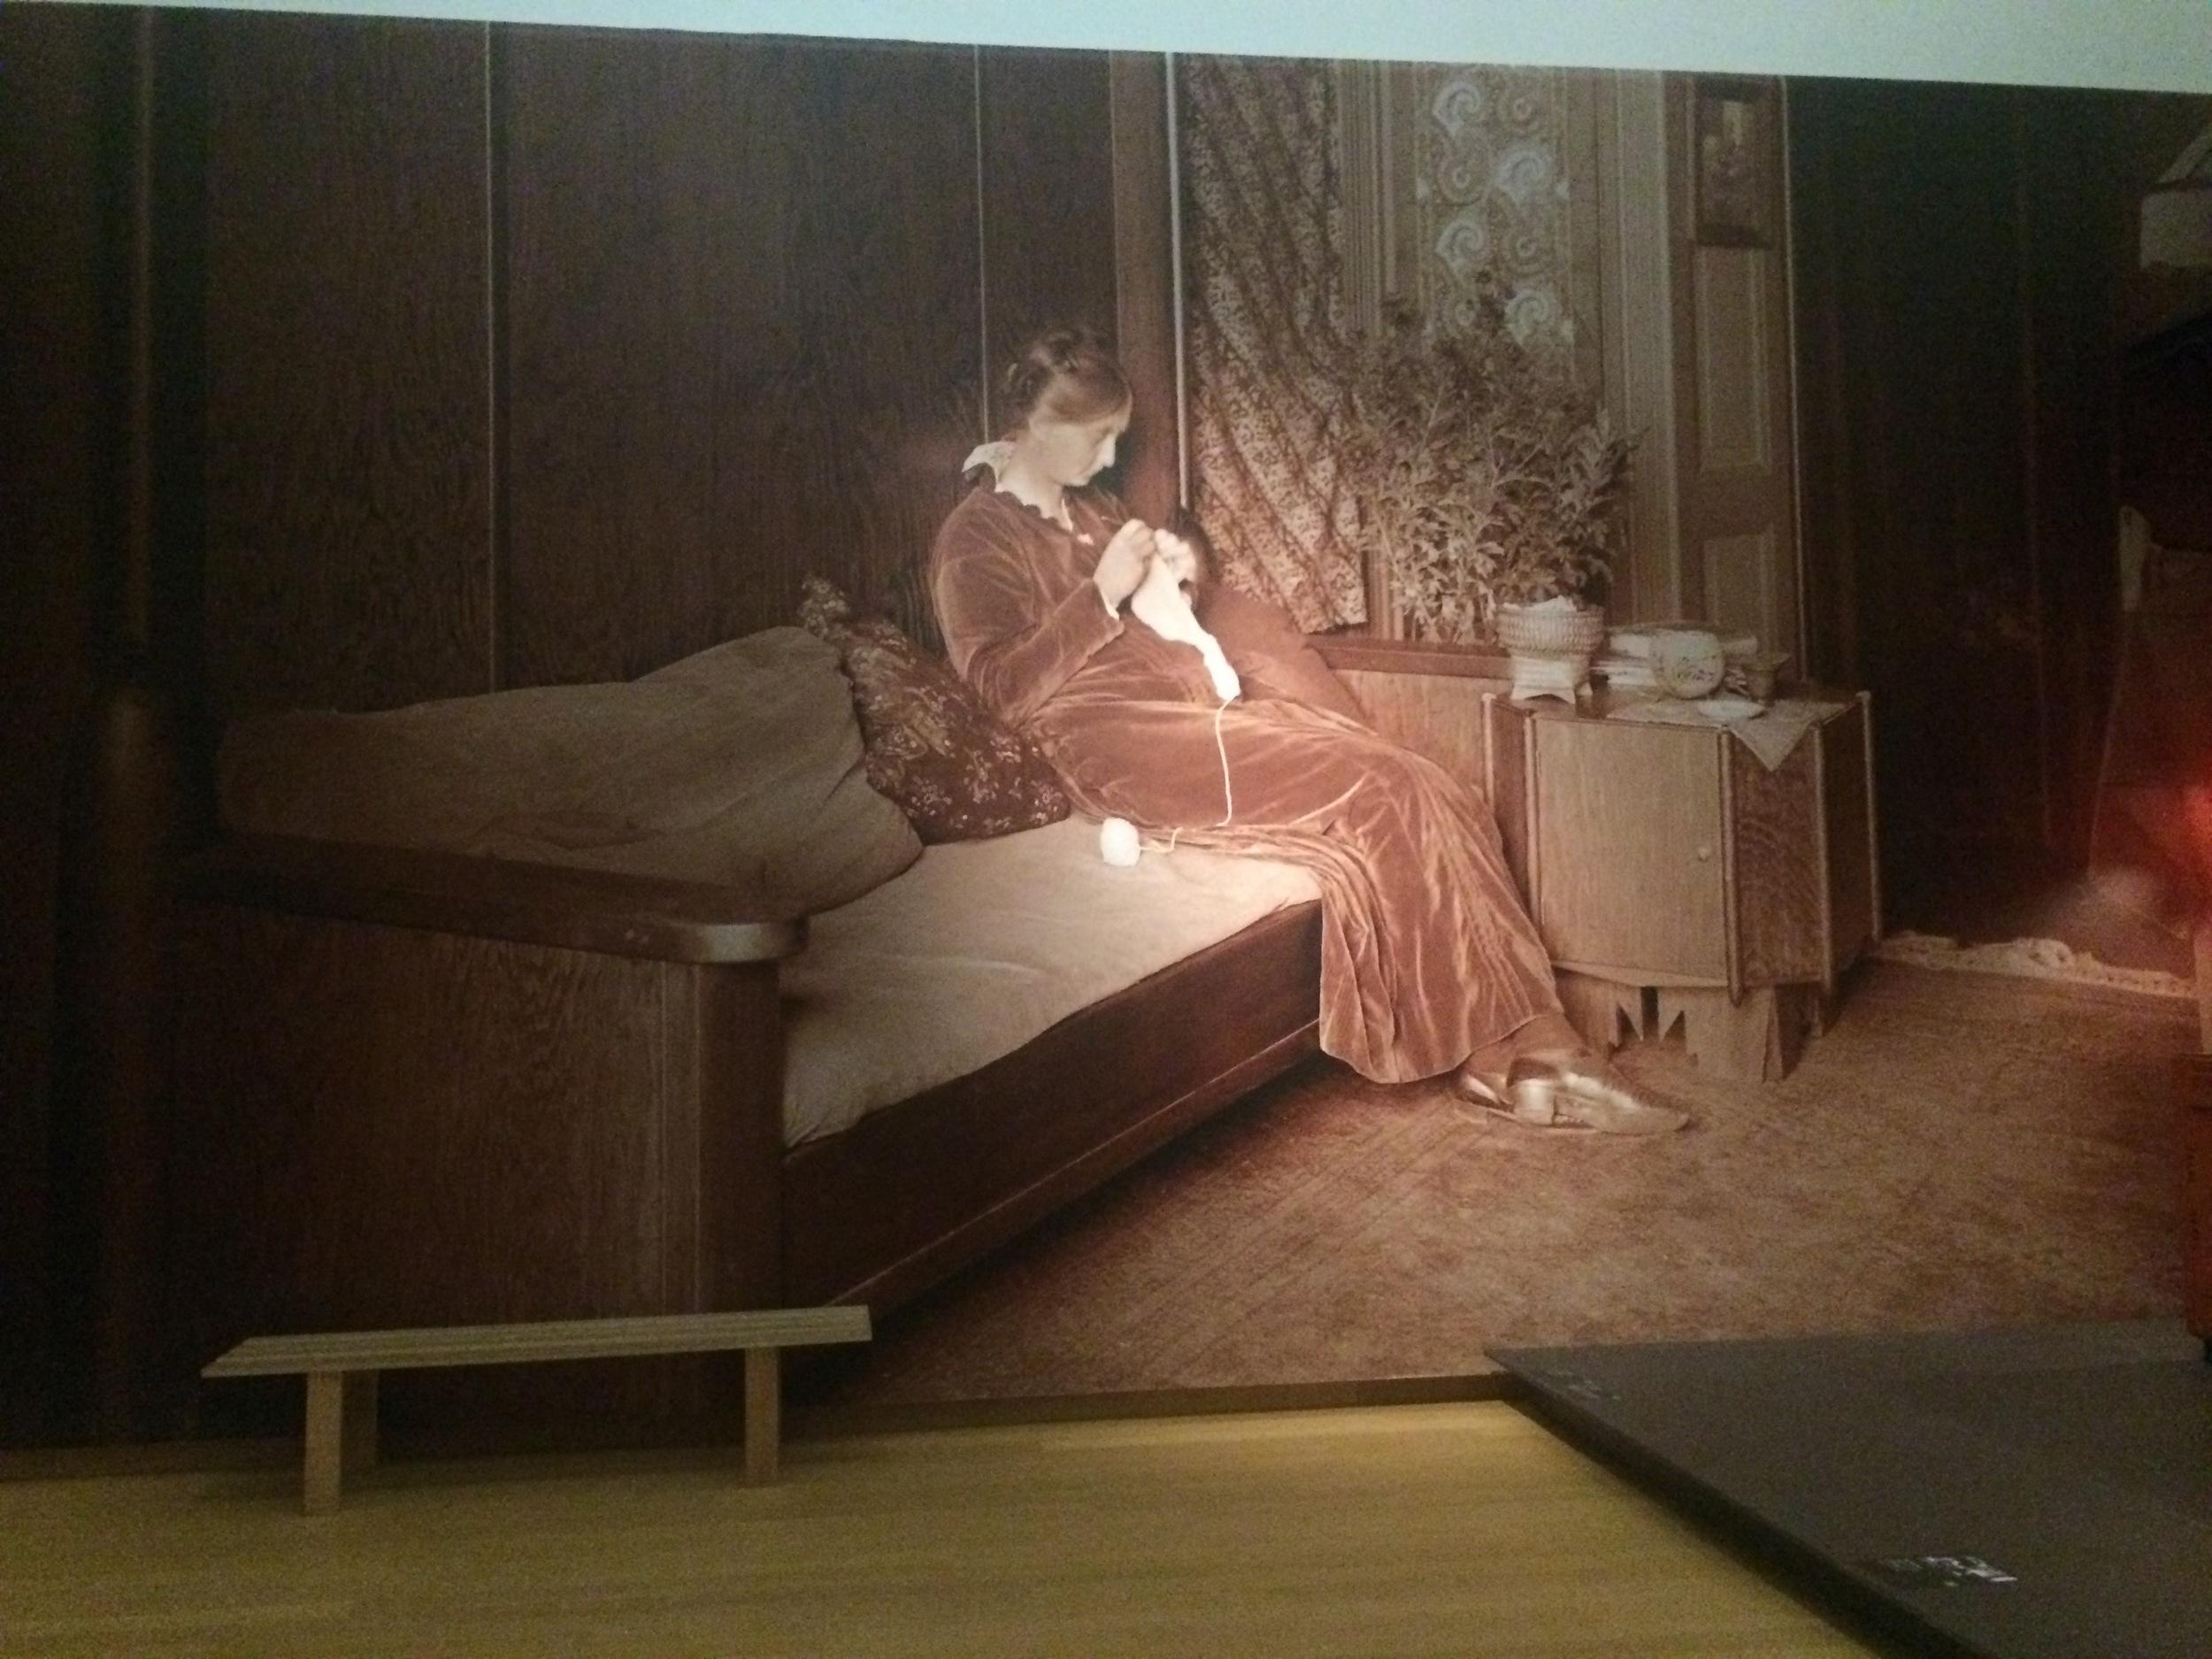 Wonen in de Amsterdamse school - De Museumpodcast